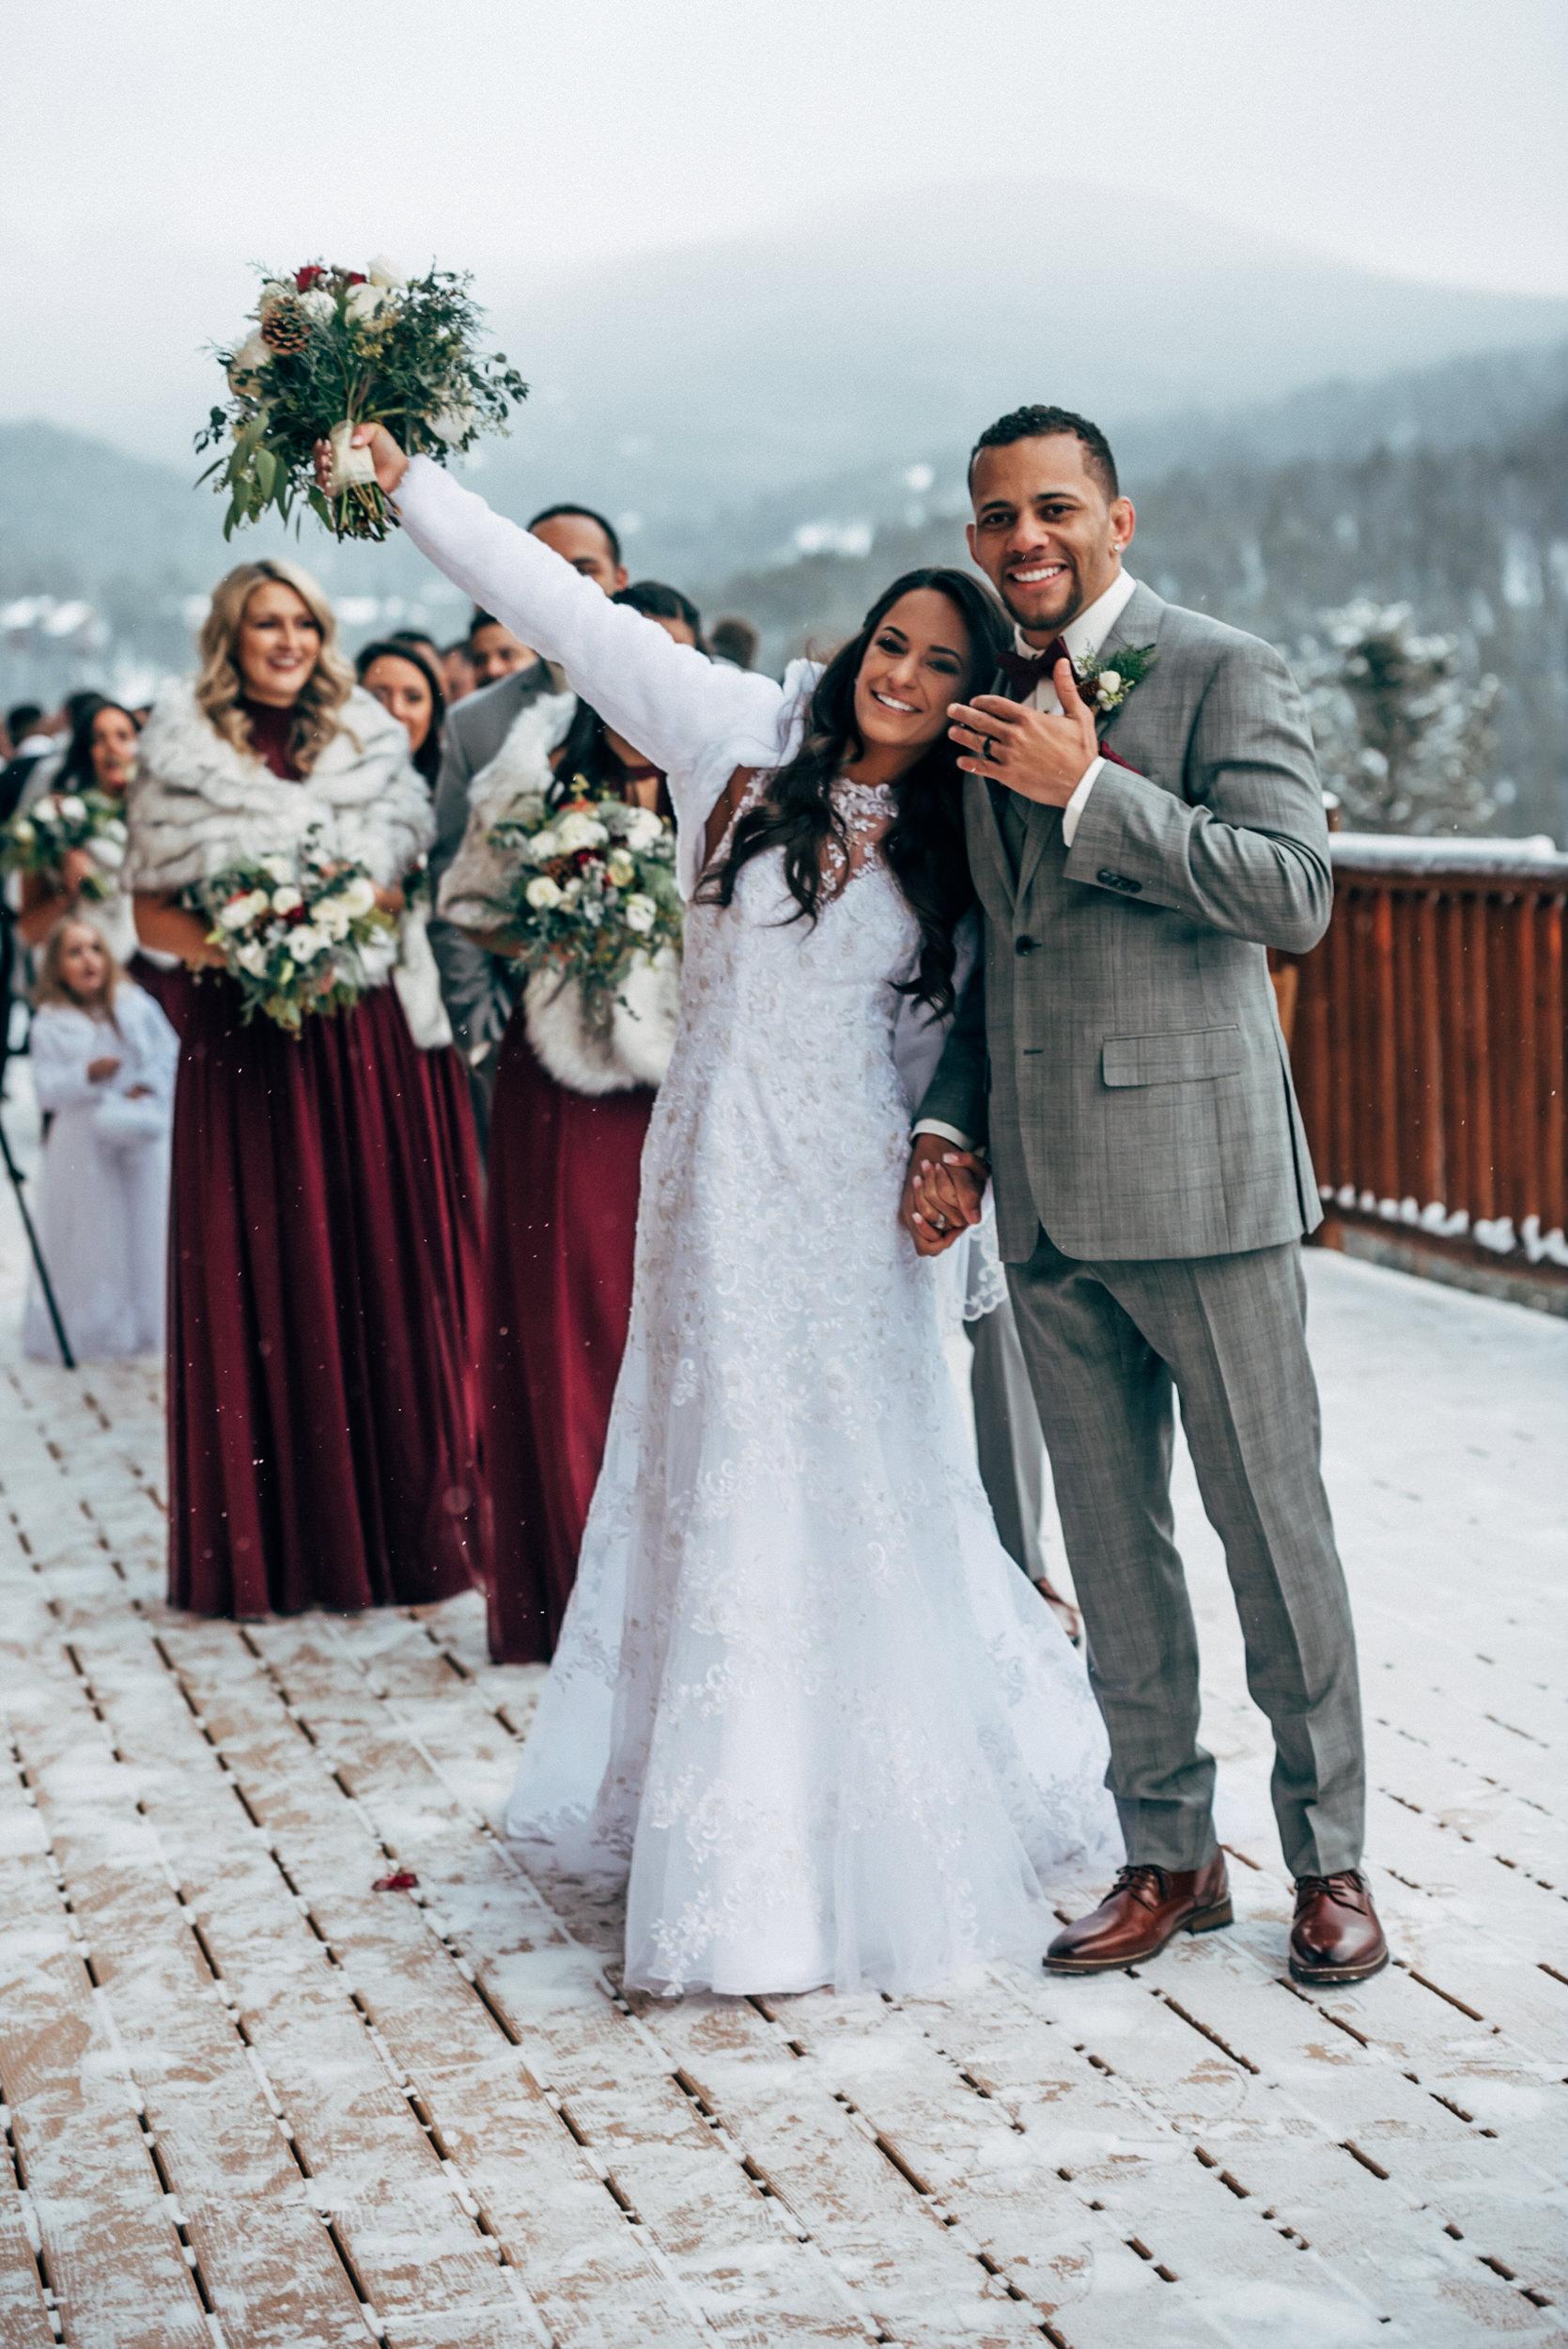 Colorado-Wedding-Photographer-Breckinridge-Mountain-Adventure-Elopement-62.jpg